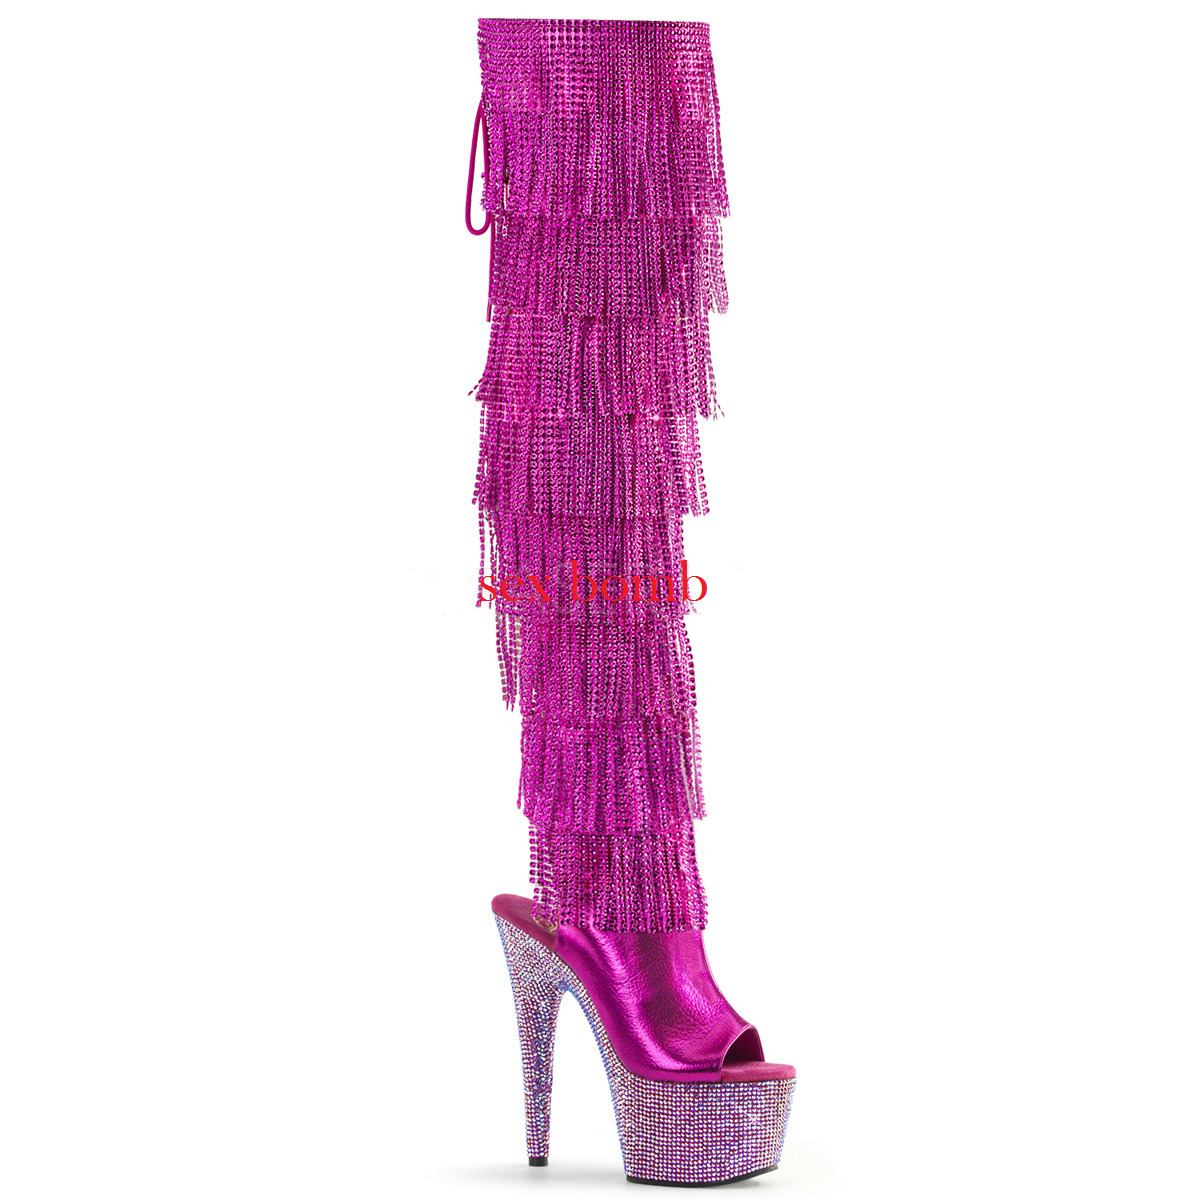 STIVALI FRANGE STRASS tacco 18 dal 35 al 40 FUCSIA plateau sandali SEXY scarpe